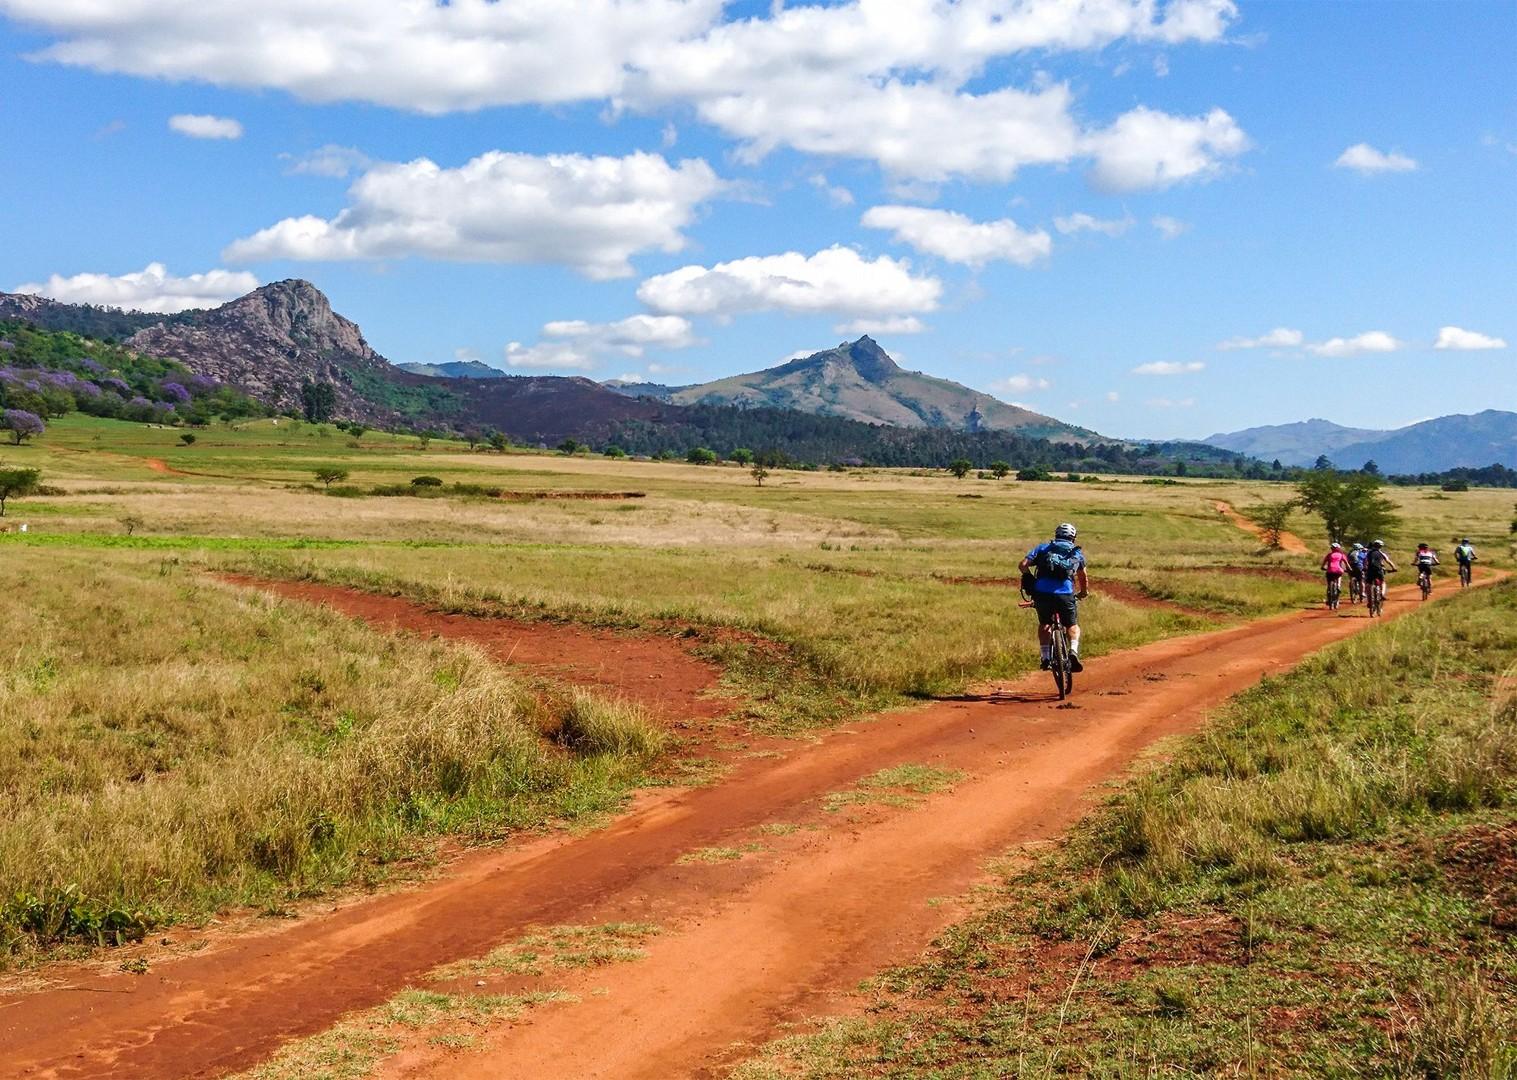 rgfdgfg2.jpg - Eswatini (Swaziland) - Cycling Safari - Cycling Adventures